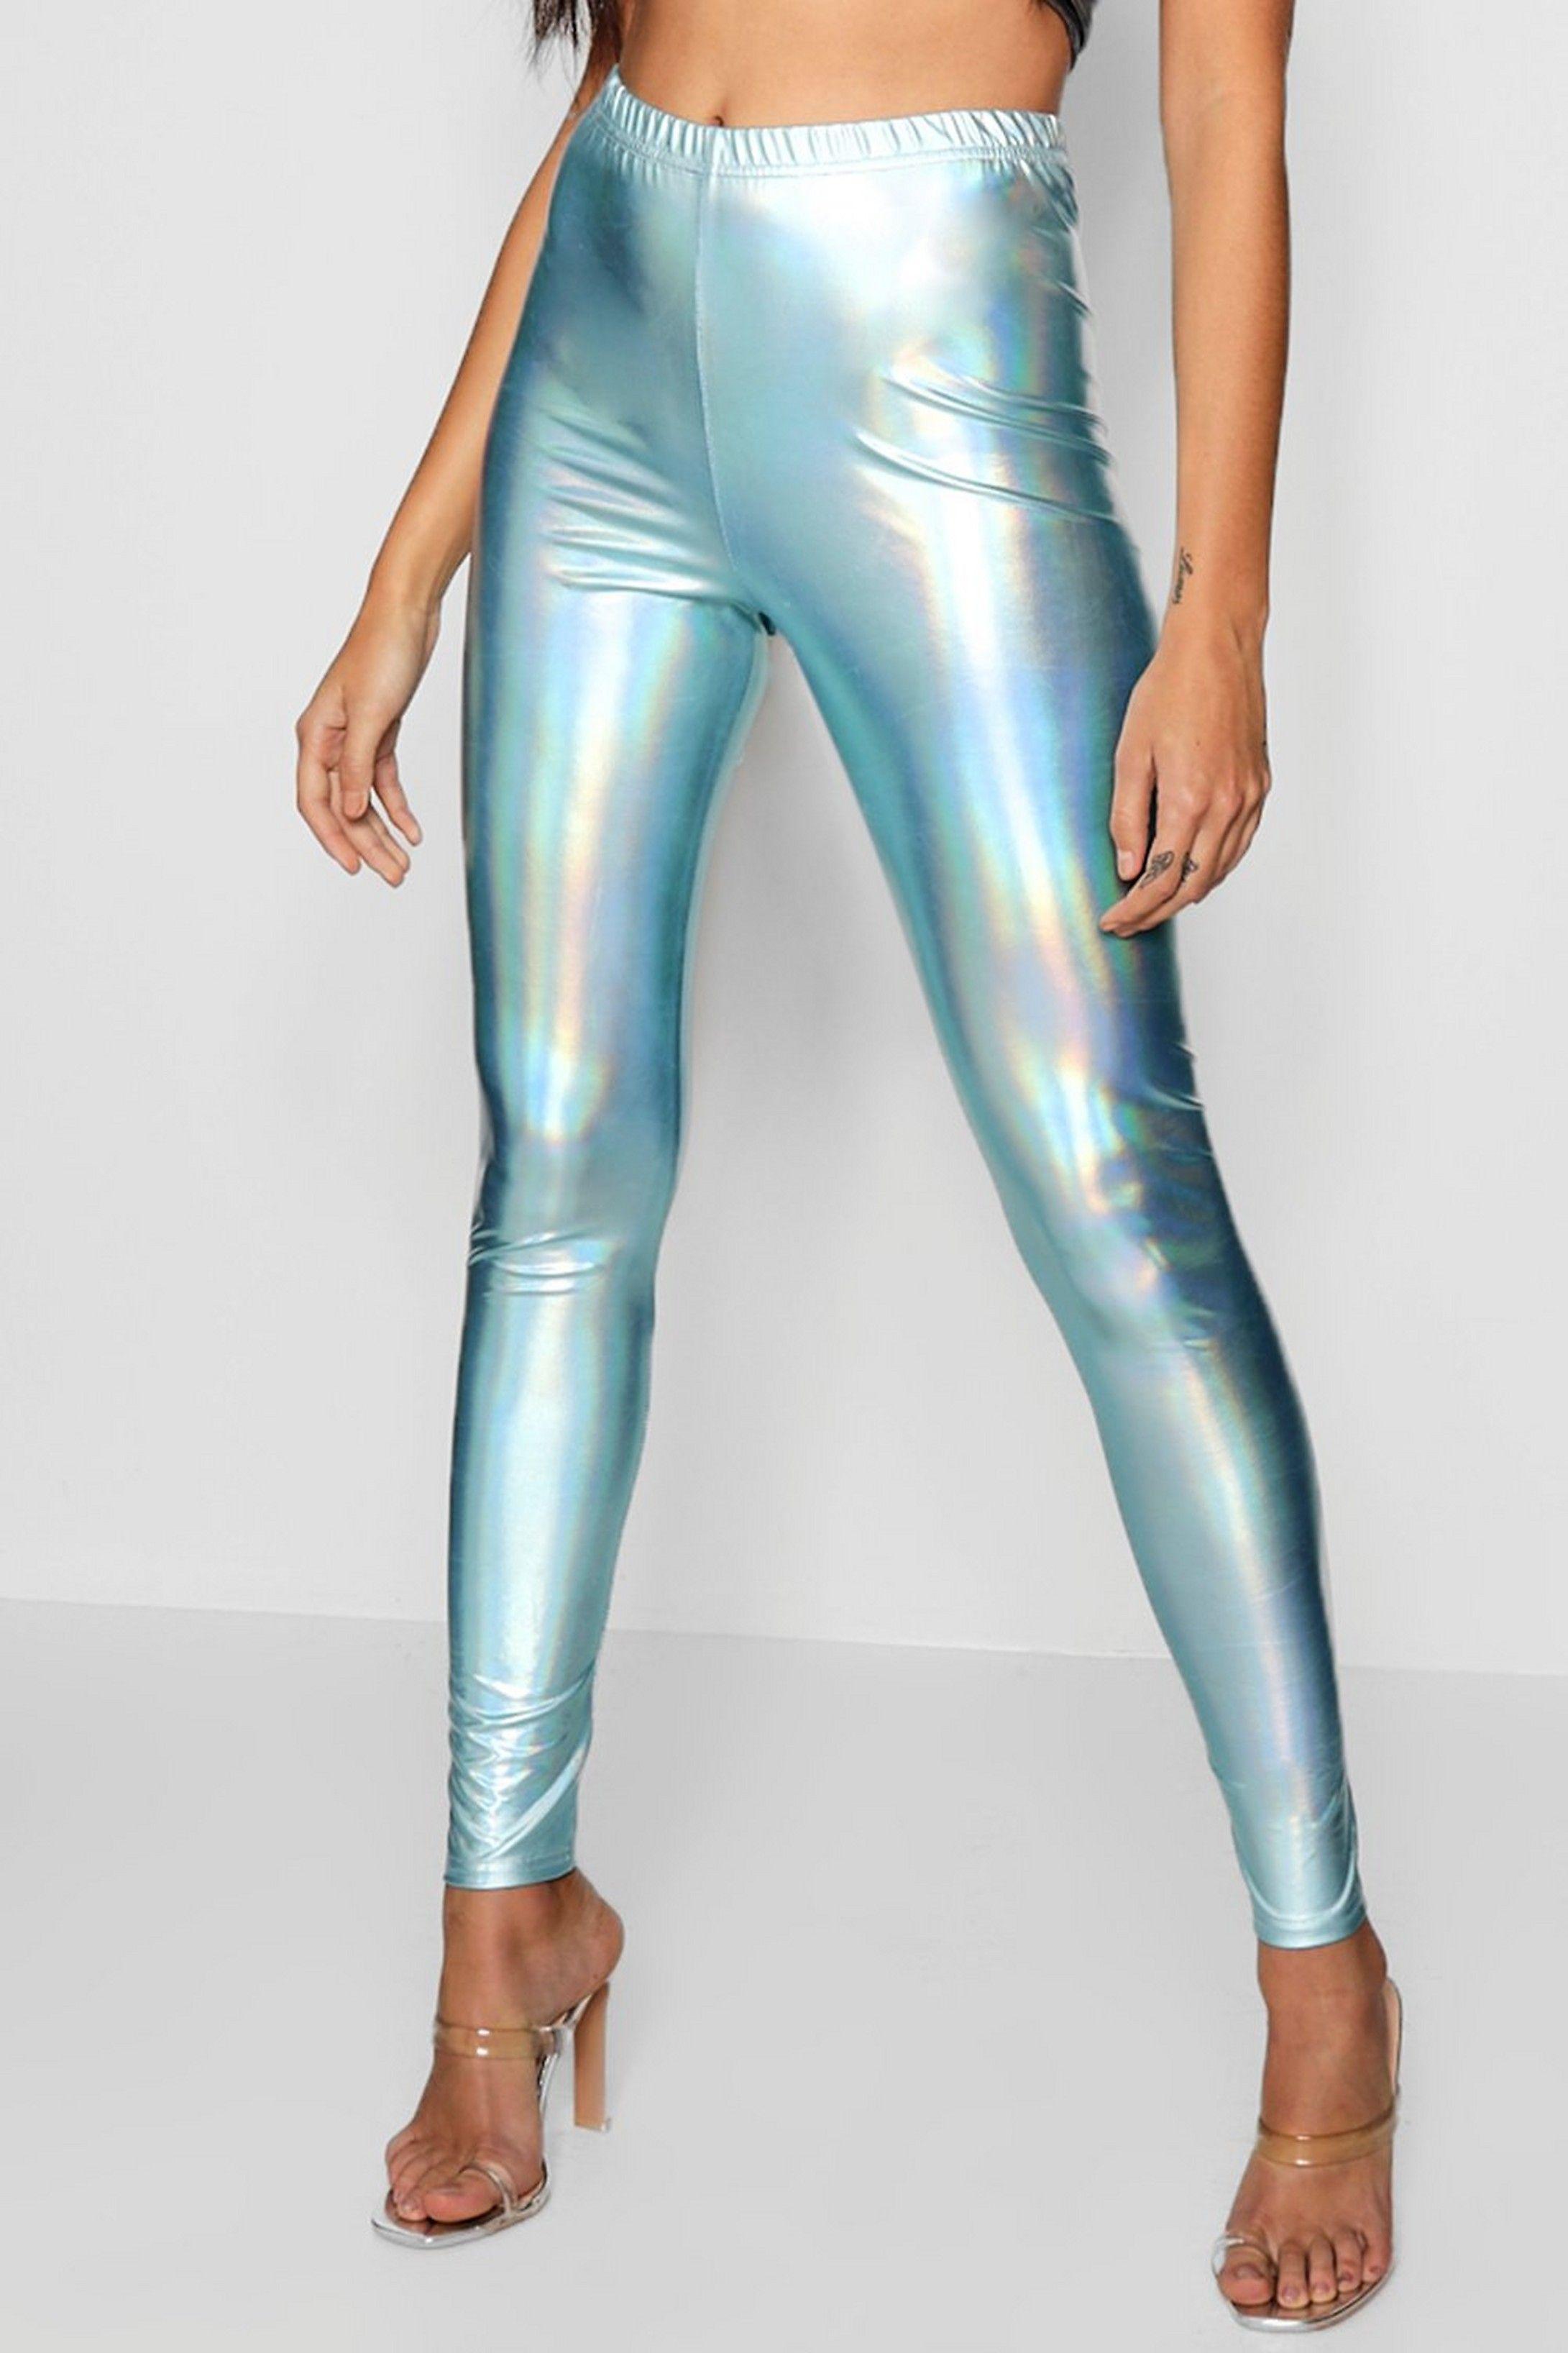 e5e0c1a51e67fe Metallic Capri Leggings; Gold, Silver Balera | Dance - stagewear & costumes  | Leggings, Capri leggings, Dance wear solutions